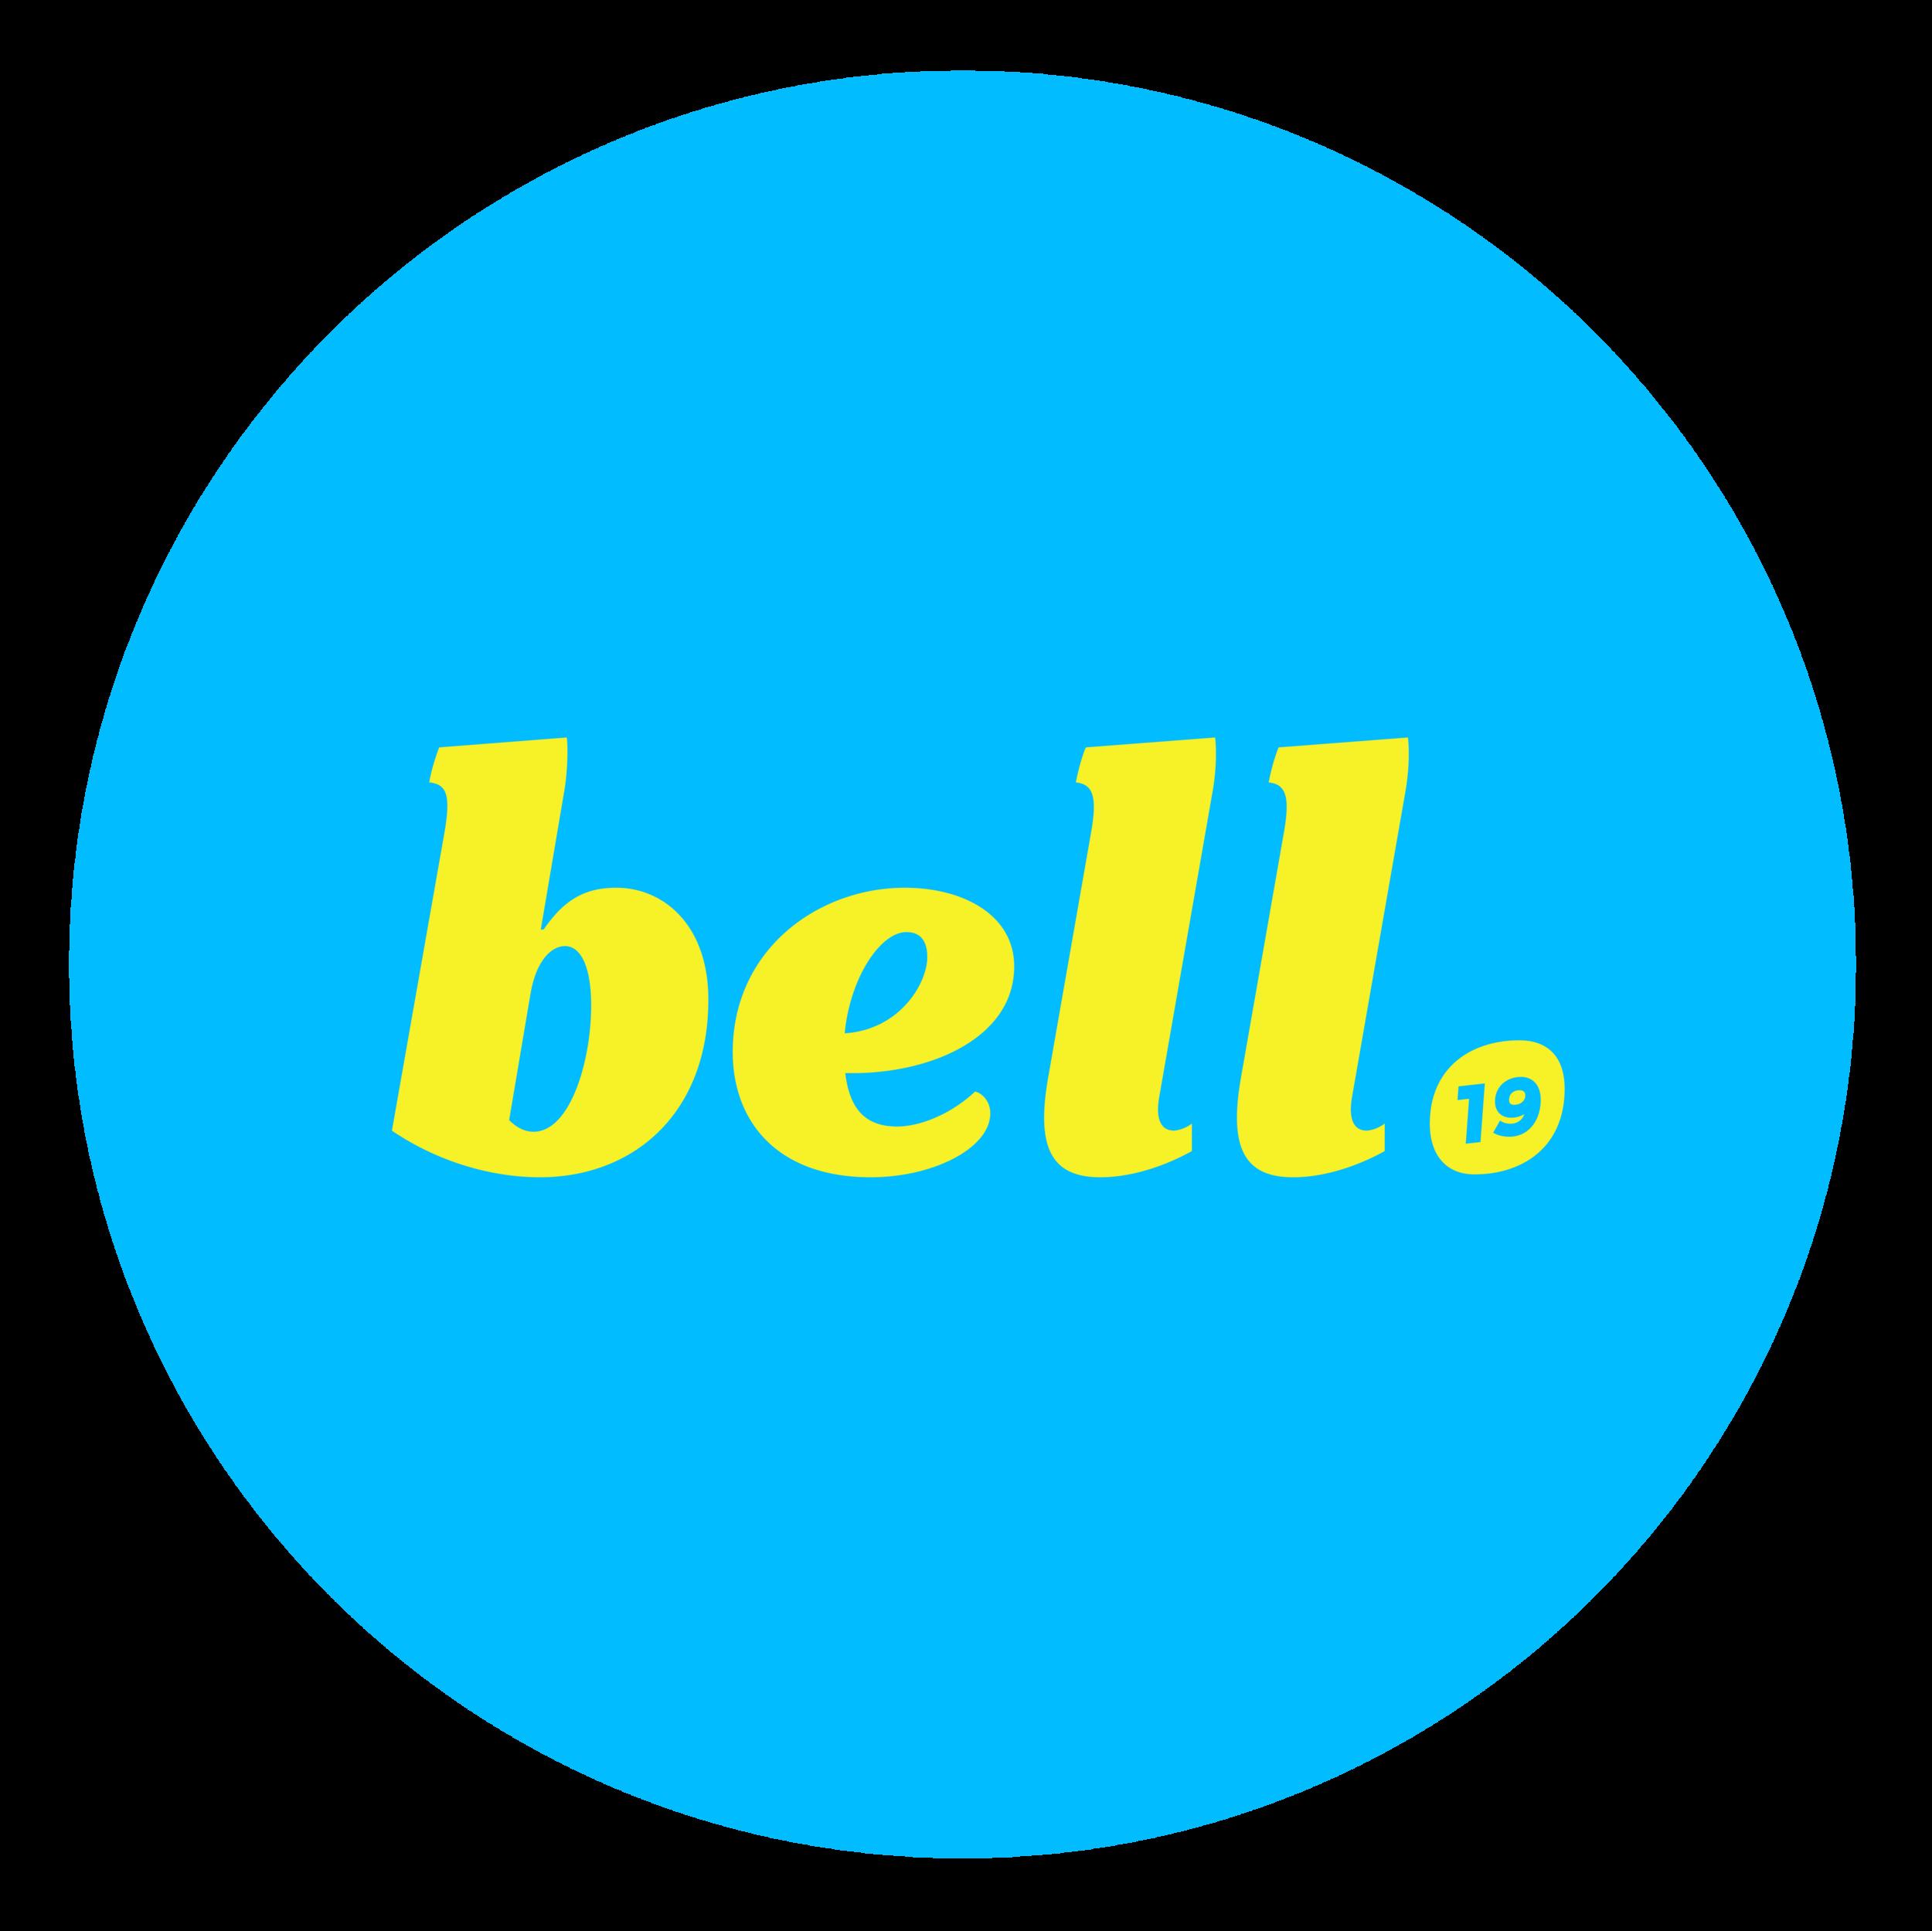 039_NBE_Logo_Digital_3.png